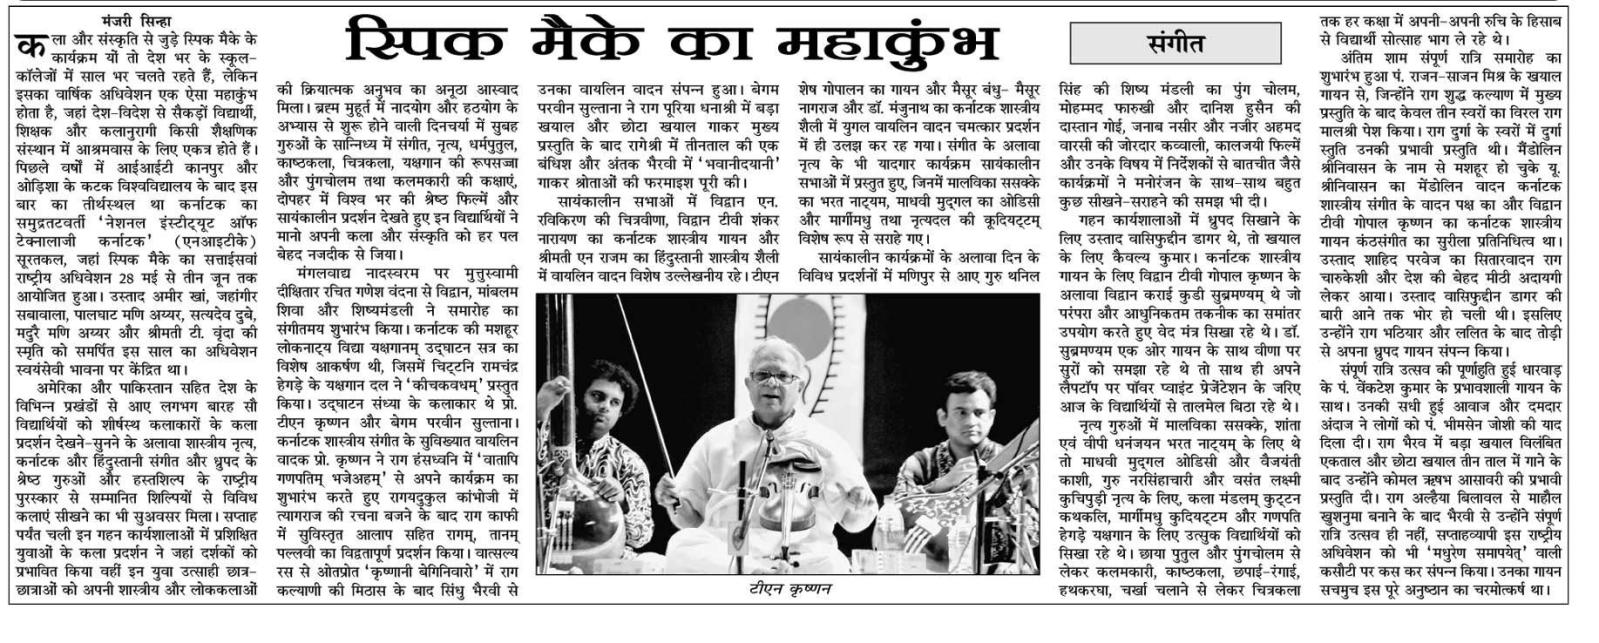 Guru T N Krishnan's inaugural concert